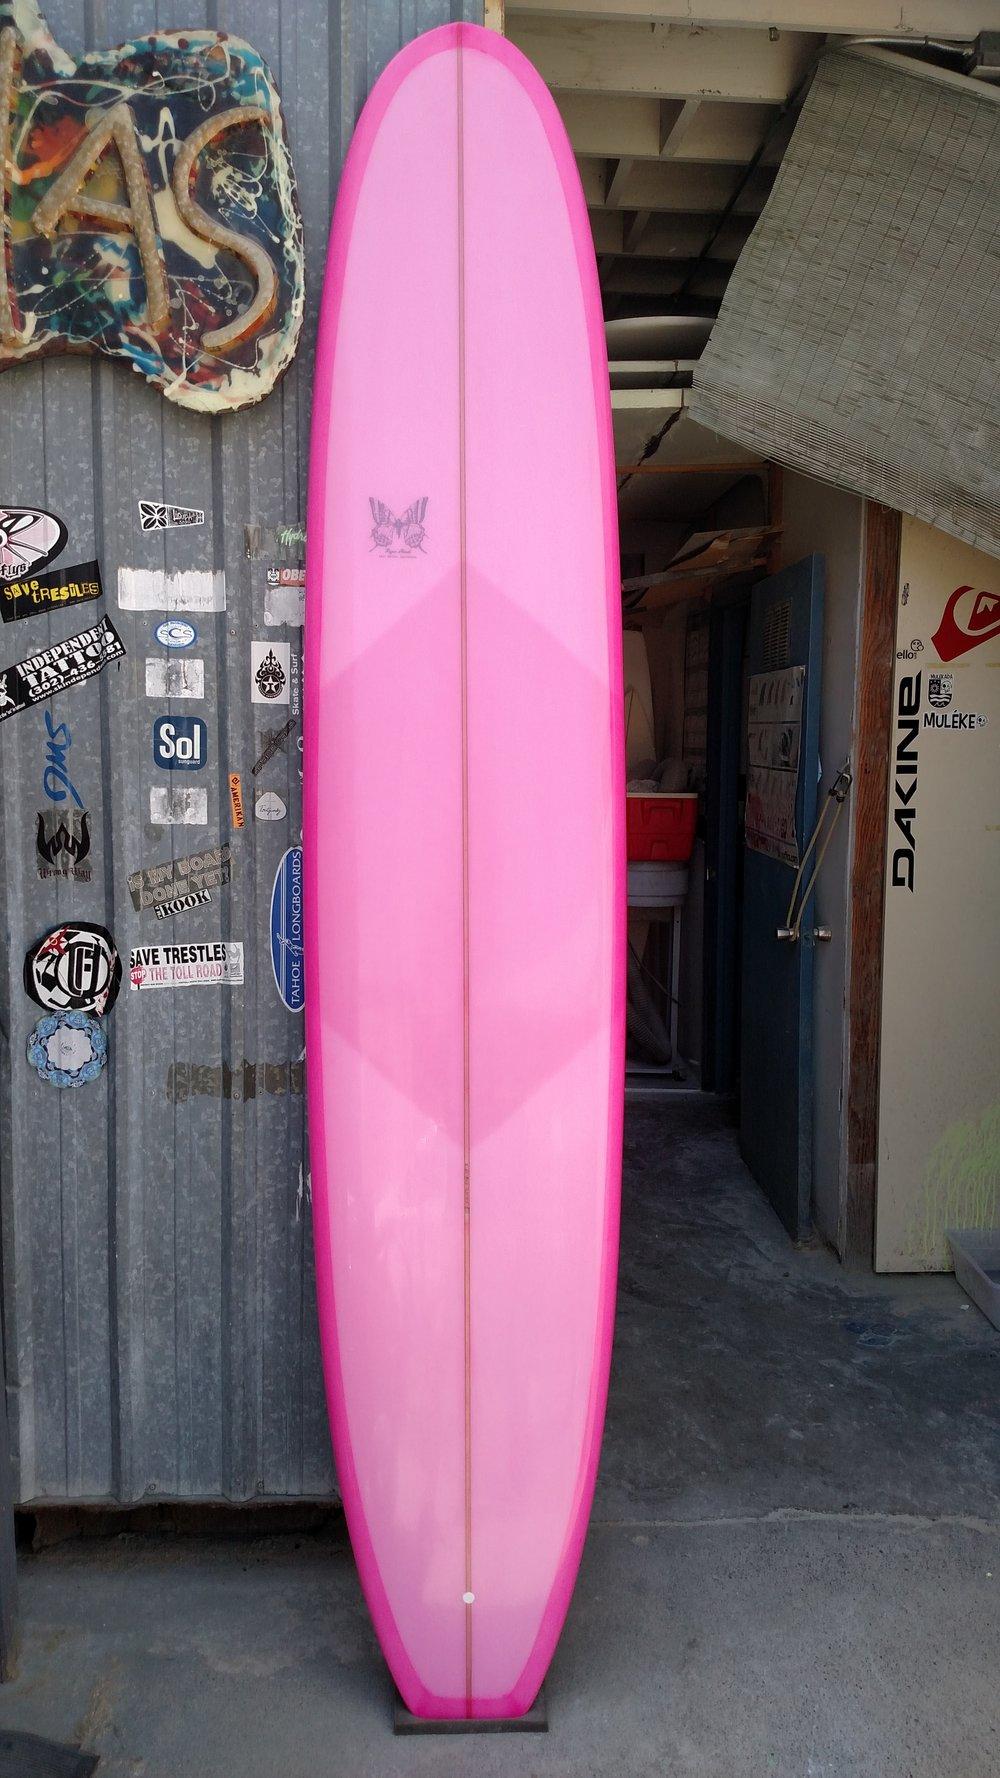 Roger-Hinds-Surfboards-Pink-Chrysalis.jpg